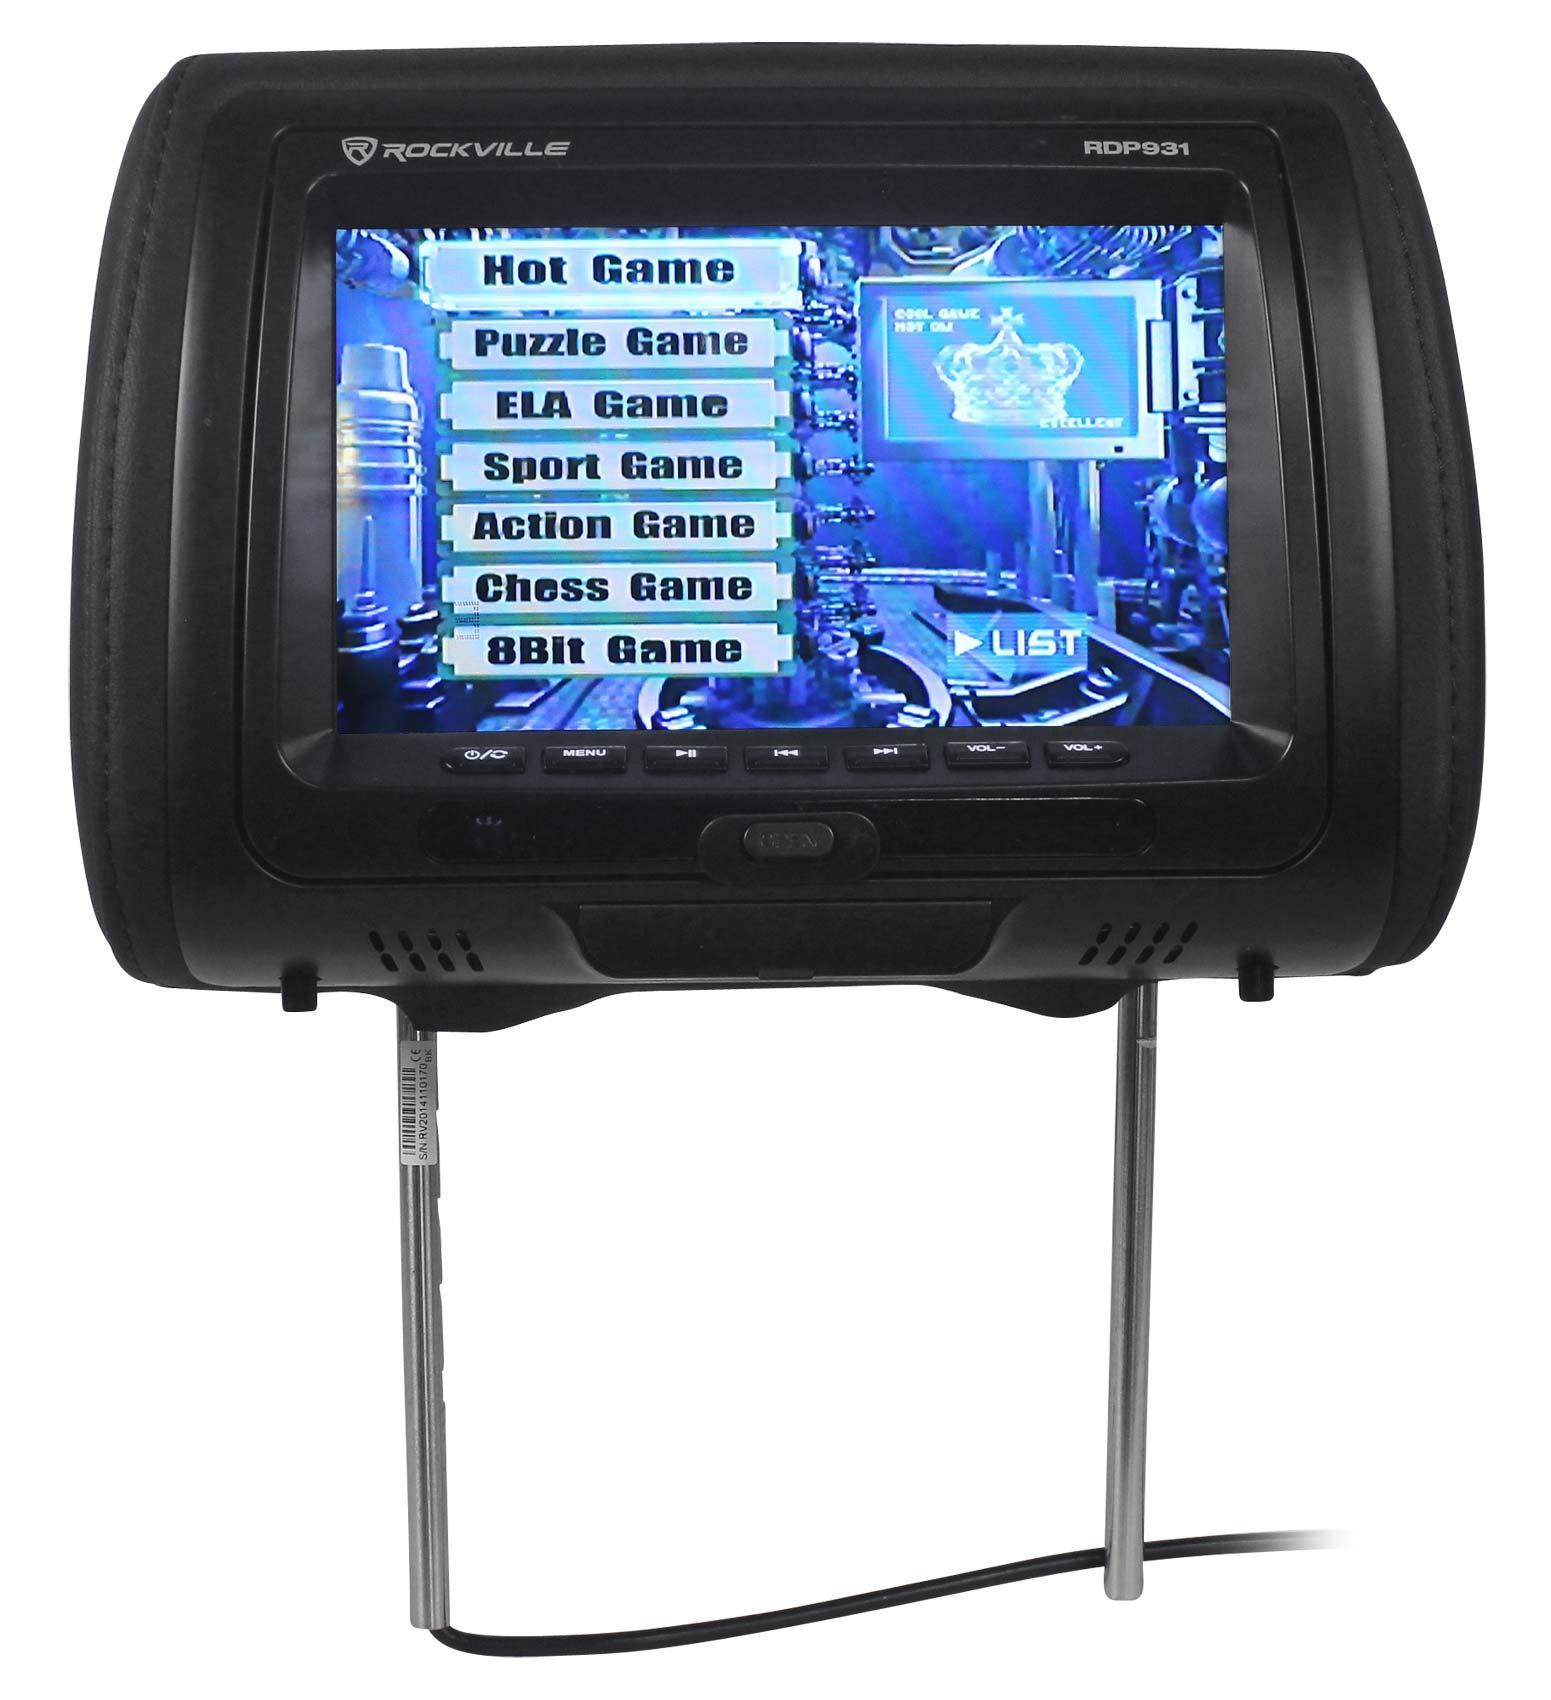 Rockville Rdp931 Bk 9 Black Car Dvd Usb Hdmi Headrest 2002 Chevy Impala Cigarette Lighter Wiring Diagram Monitors W Video Games